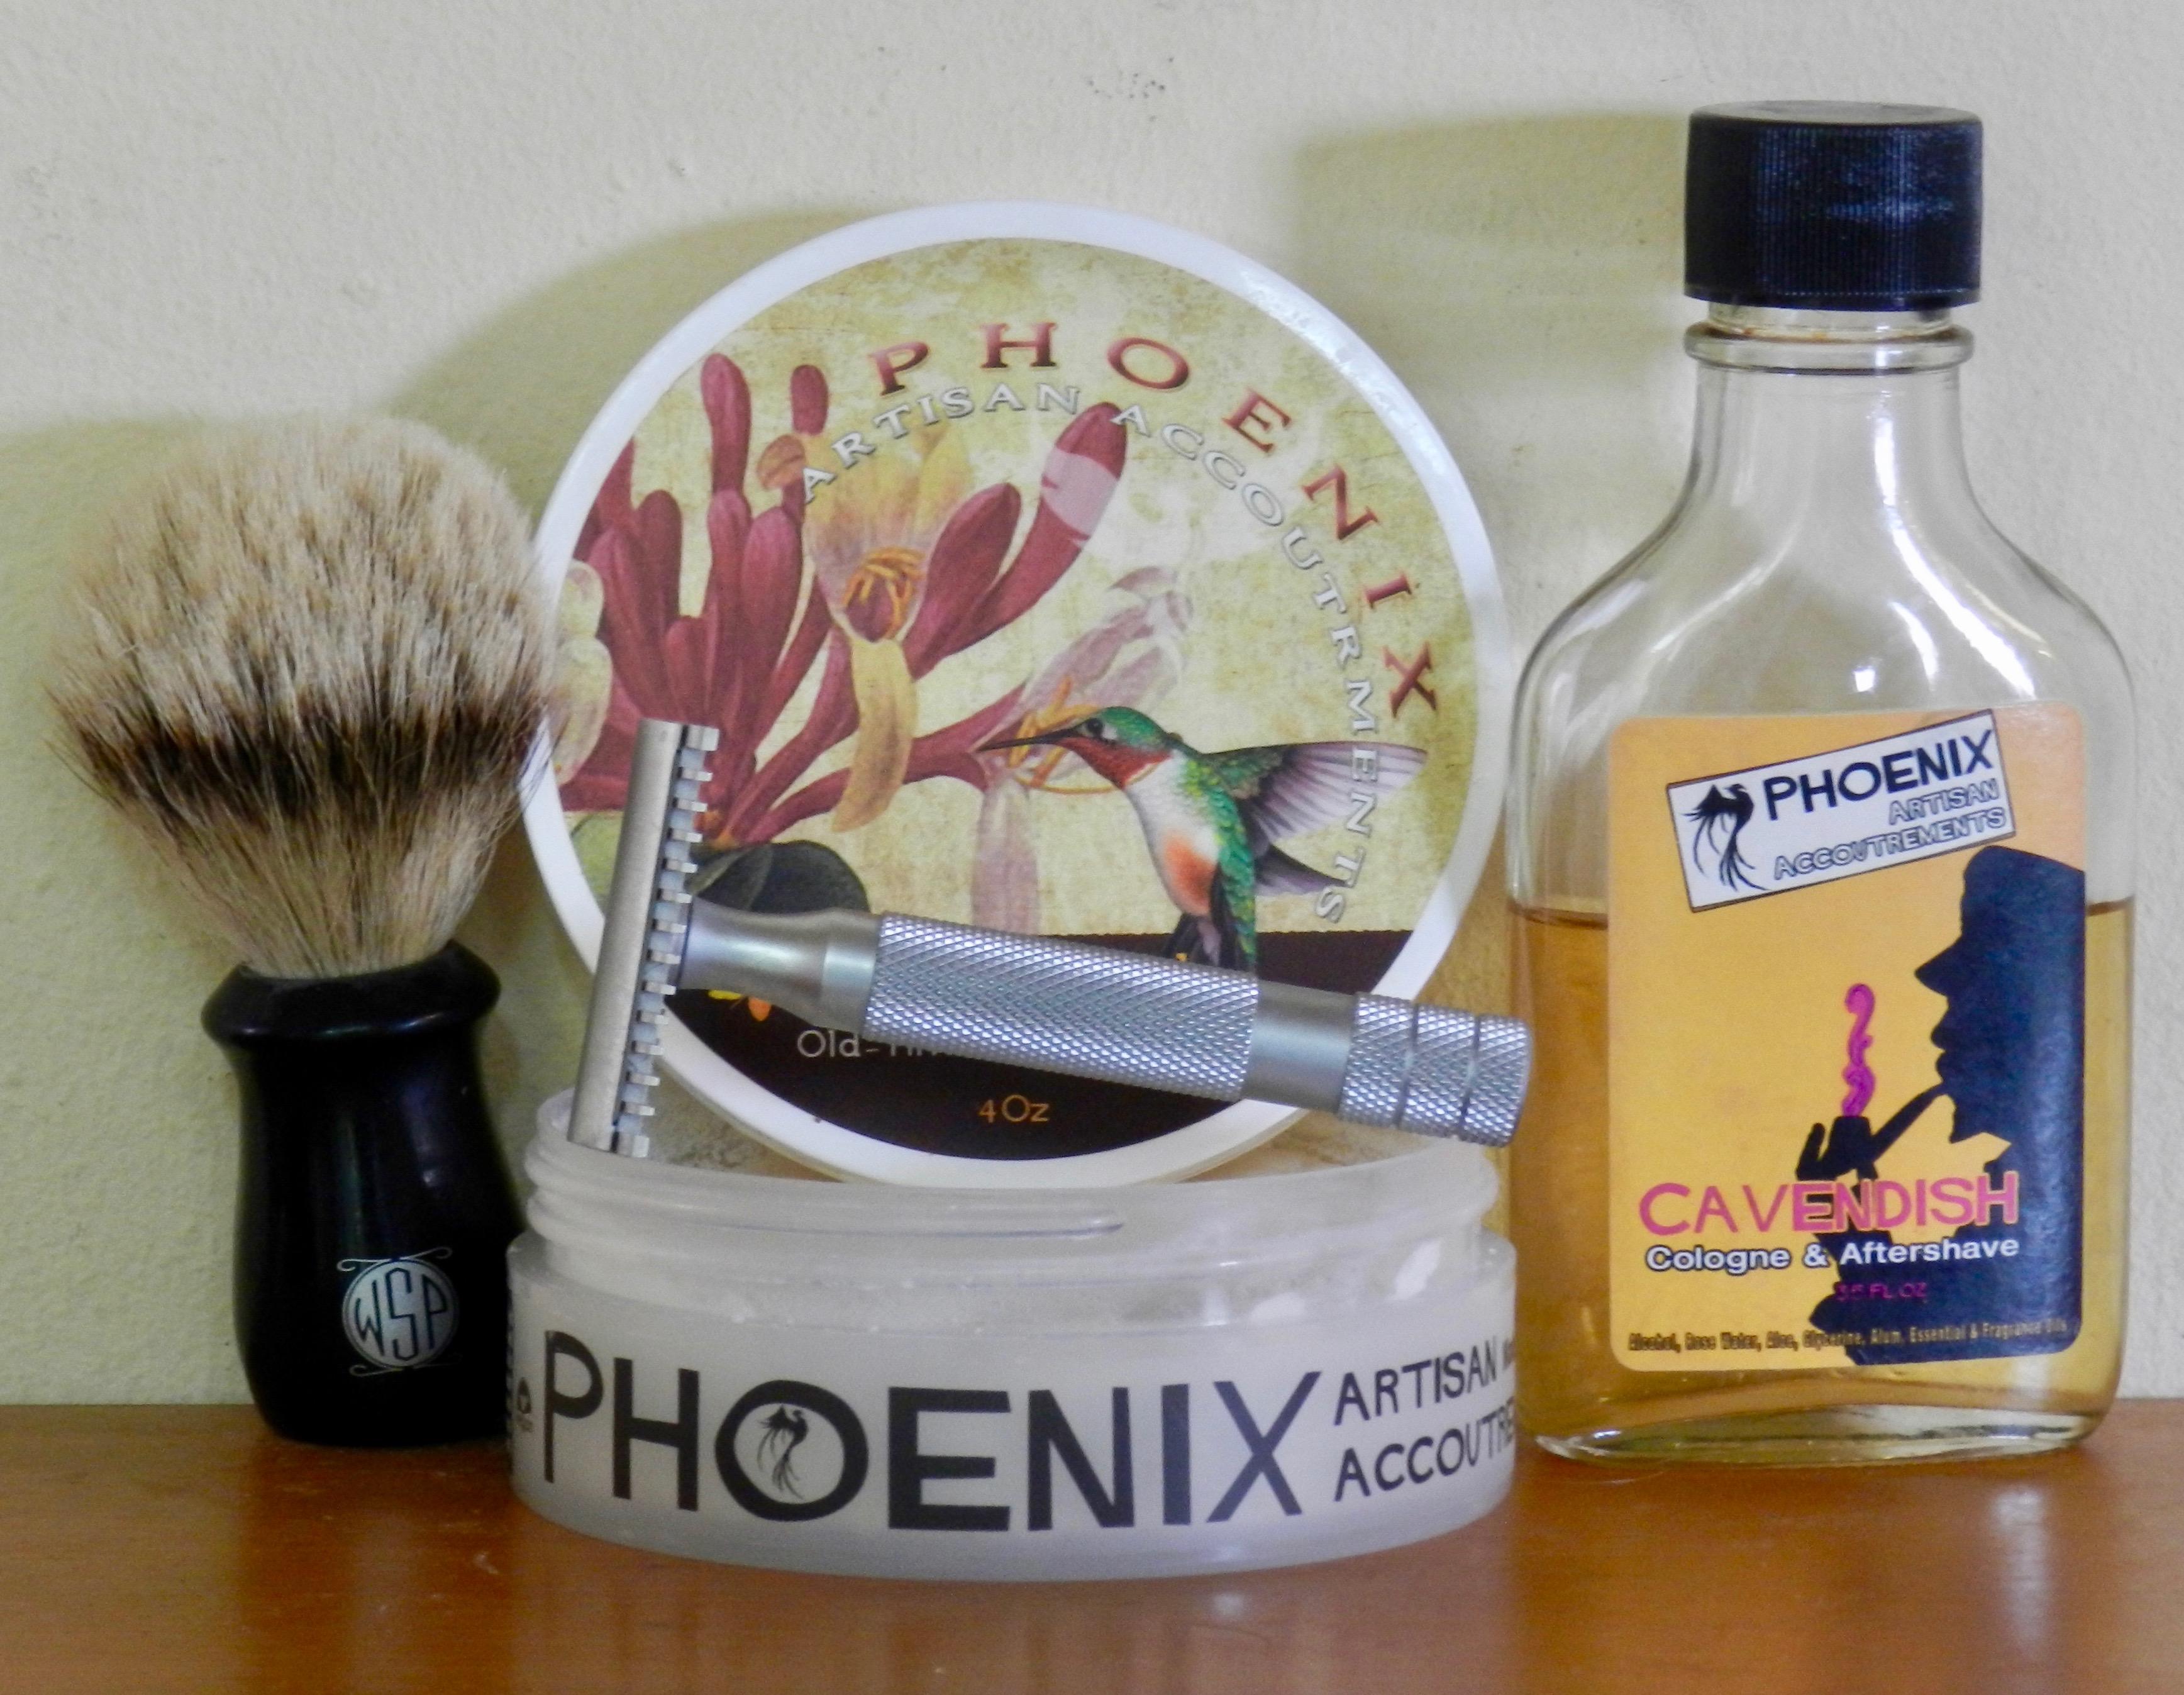 iKon open-comb and Phoenix Artisan Honeysuckle soap with WSP